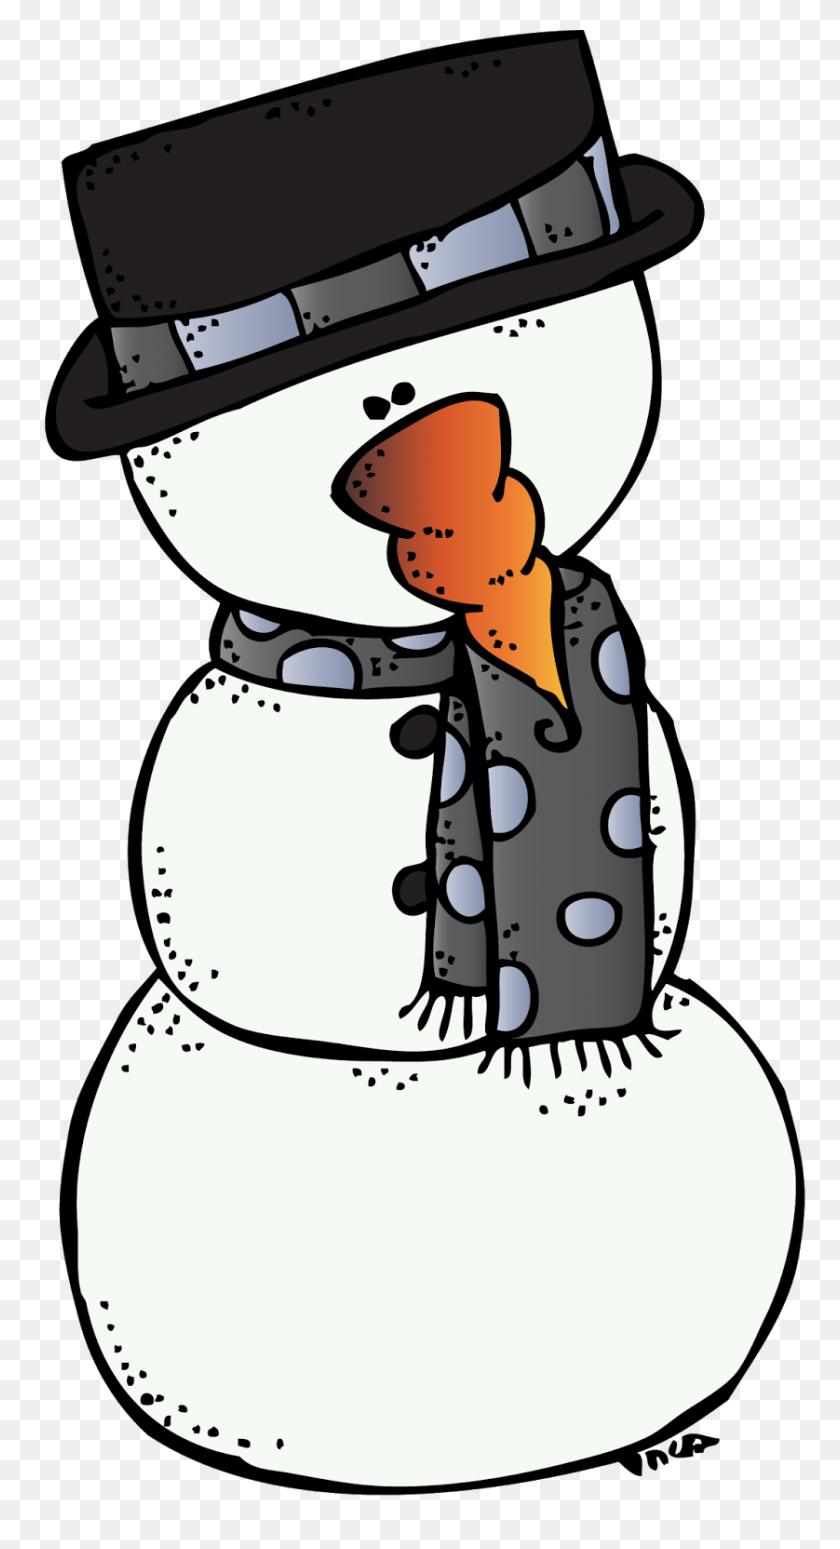 Image Result For Melonheadz Snow Melonheadz - Melonheadz Christmas Clipart